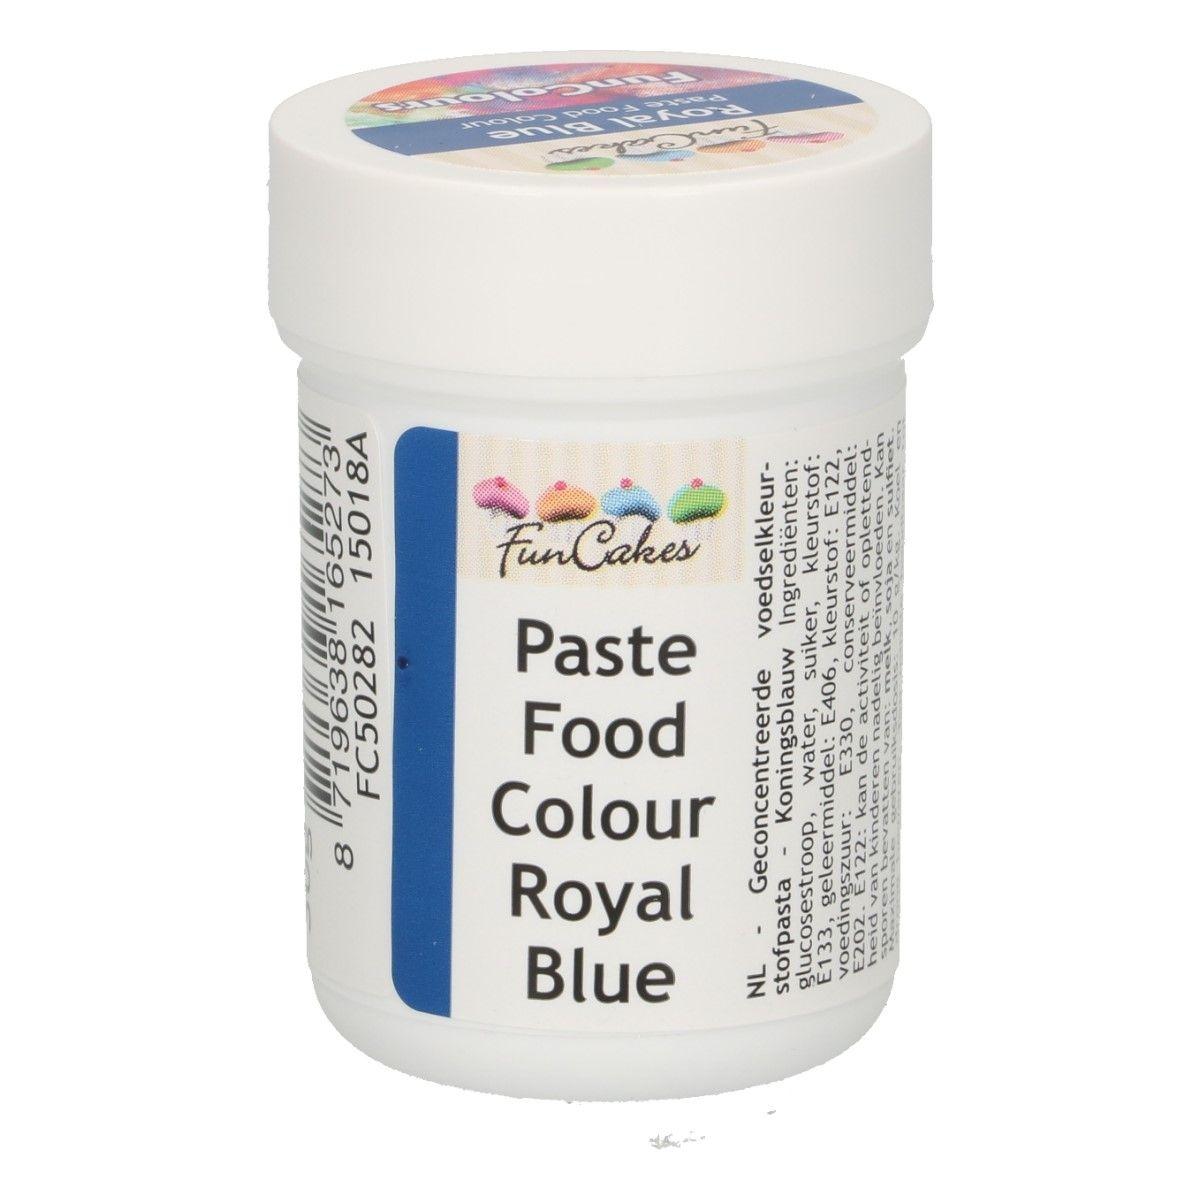 /f/u/funcakes_funcolours_paste_food_colour_-_royal_blue.jpg